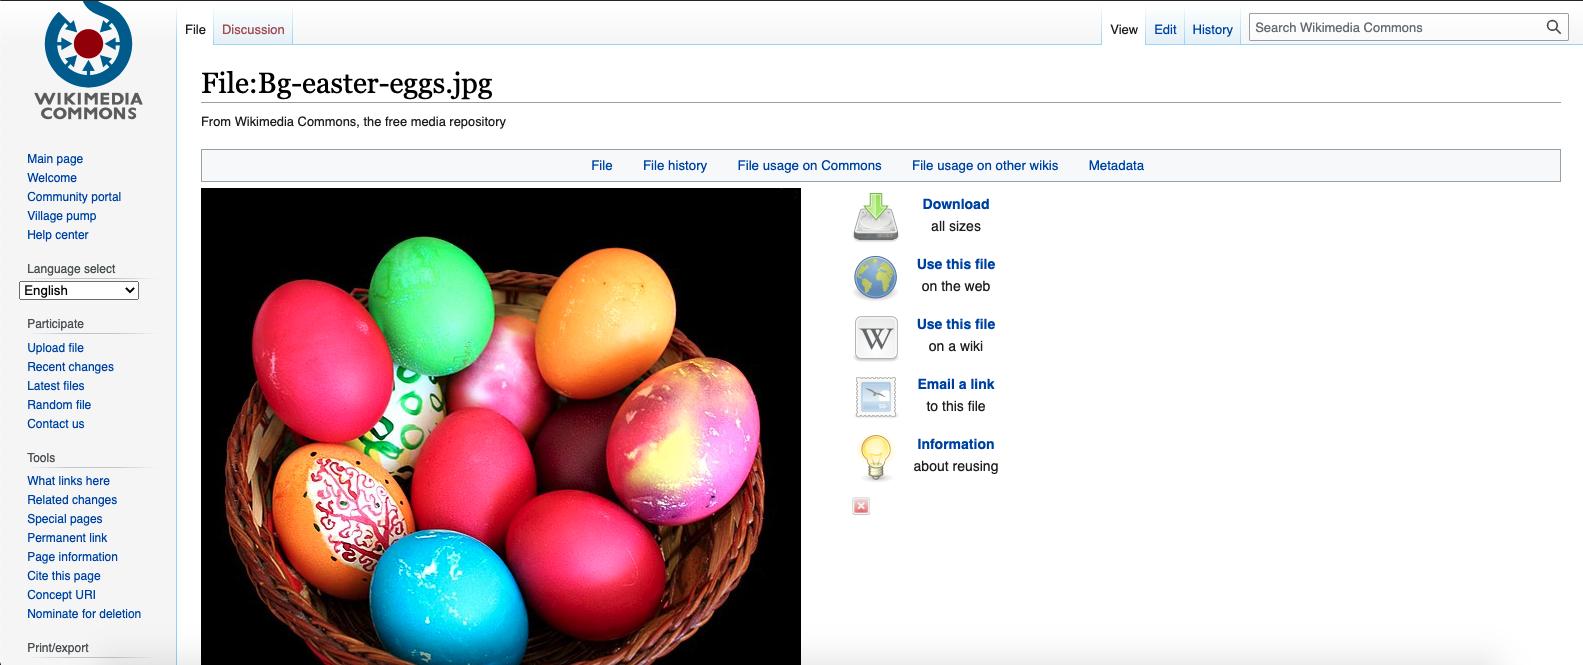 internet-huevo-de-pascua-wikipedia-revel